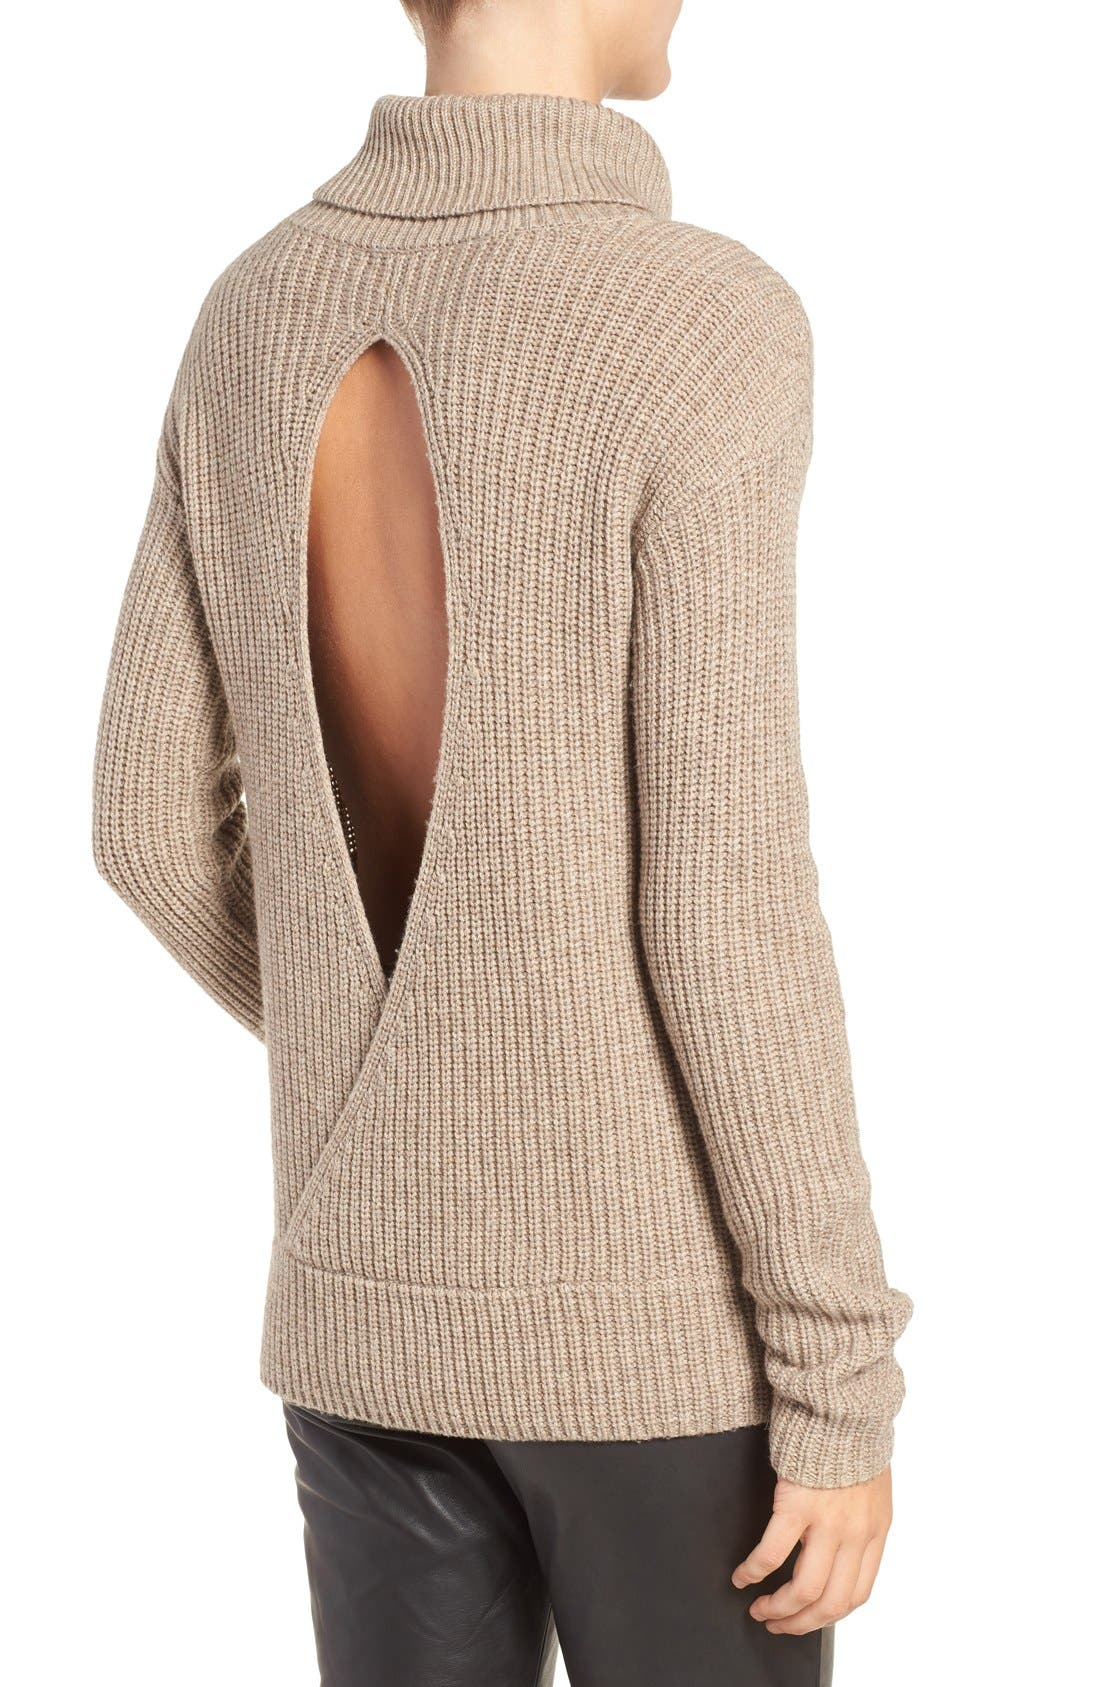 Alternate Image 1 Selected - Olivia Palermo + Chelsea28 Open Back Wool & Cashmere Turtleneck Sweater